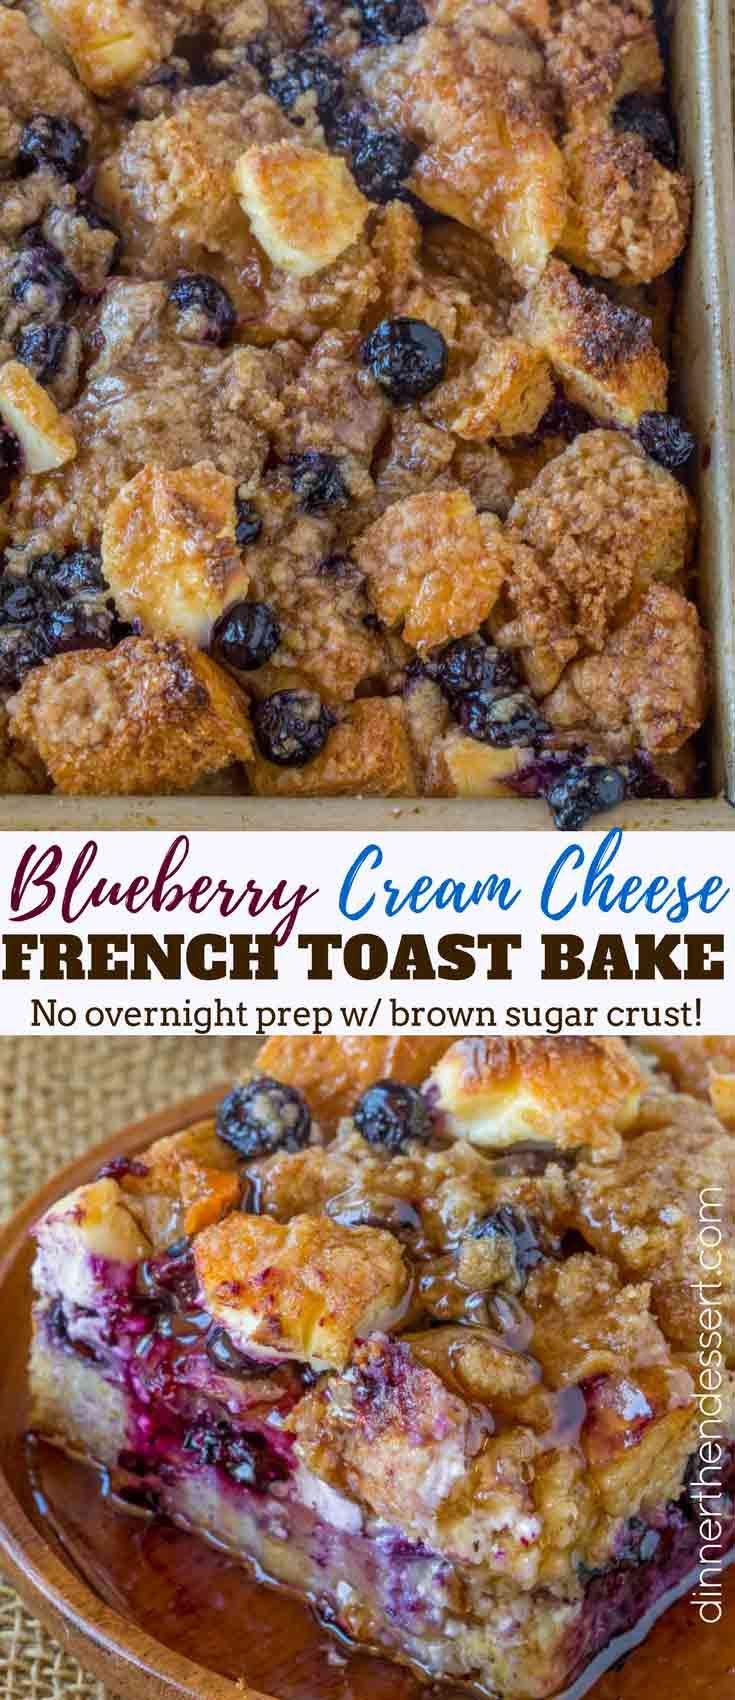 Blueberry Cream Cheese French Toast Bake - Dinner, then Dessert